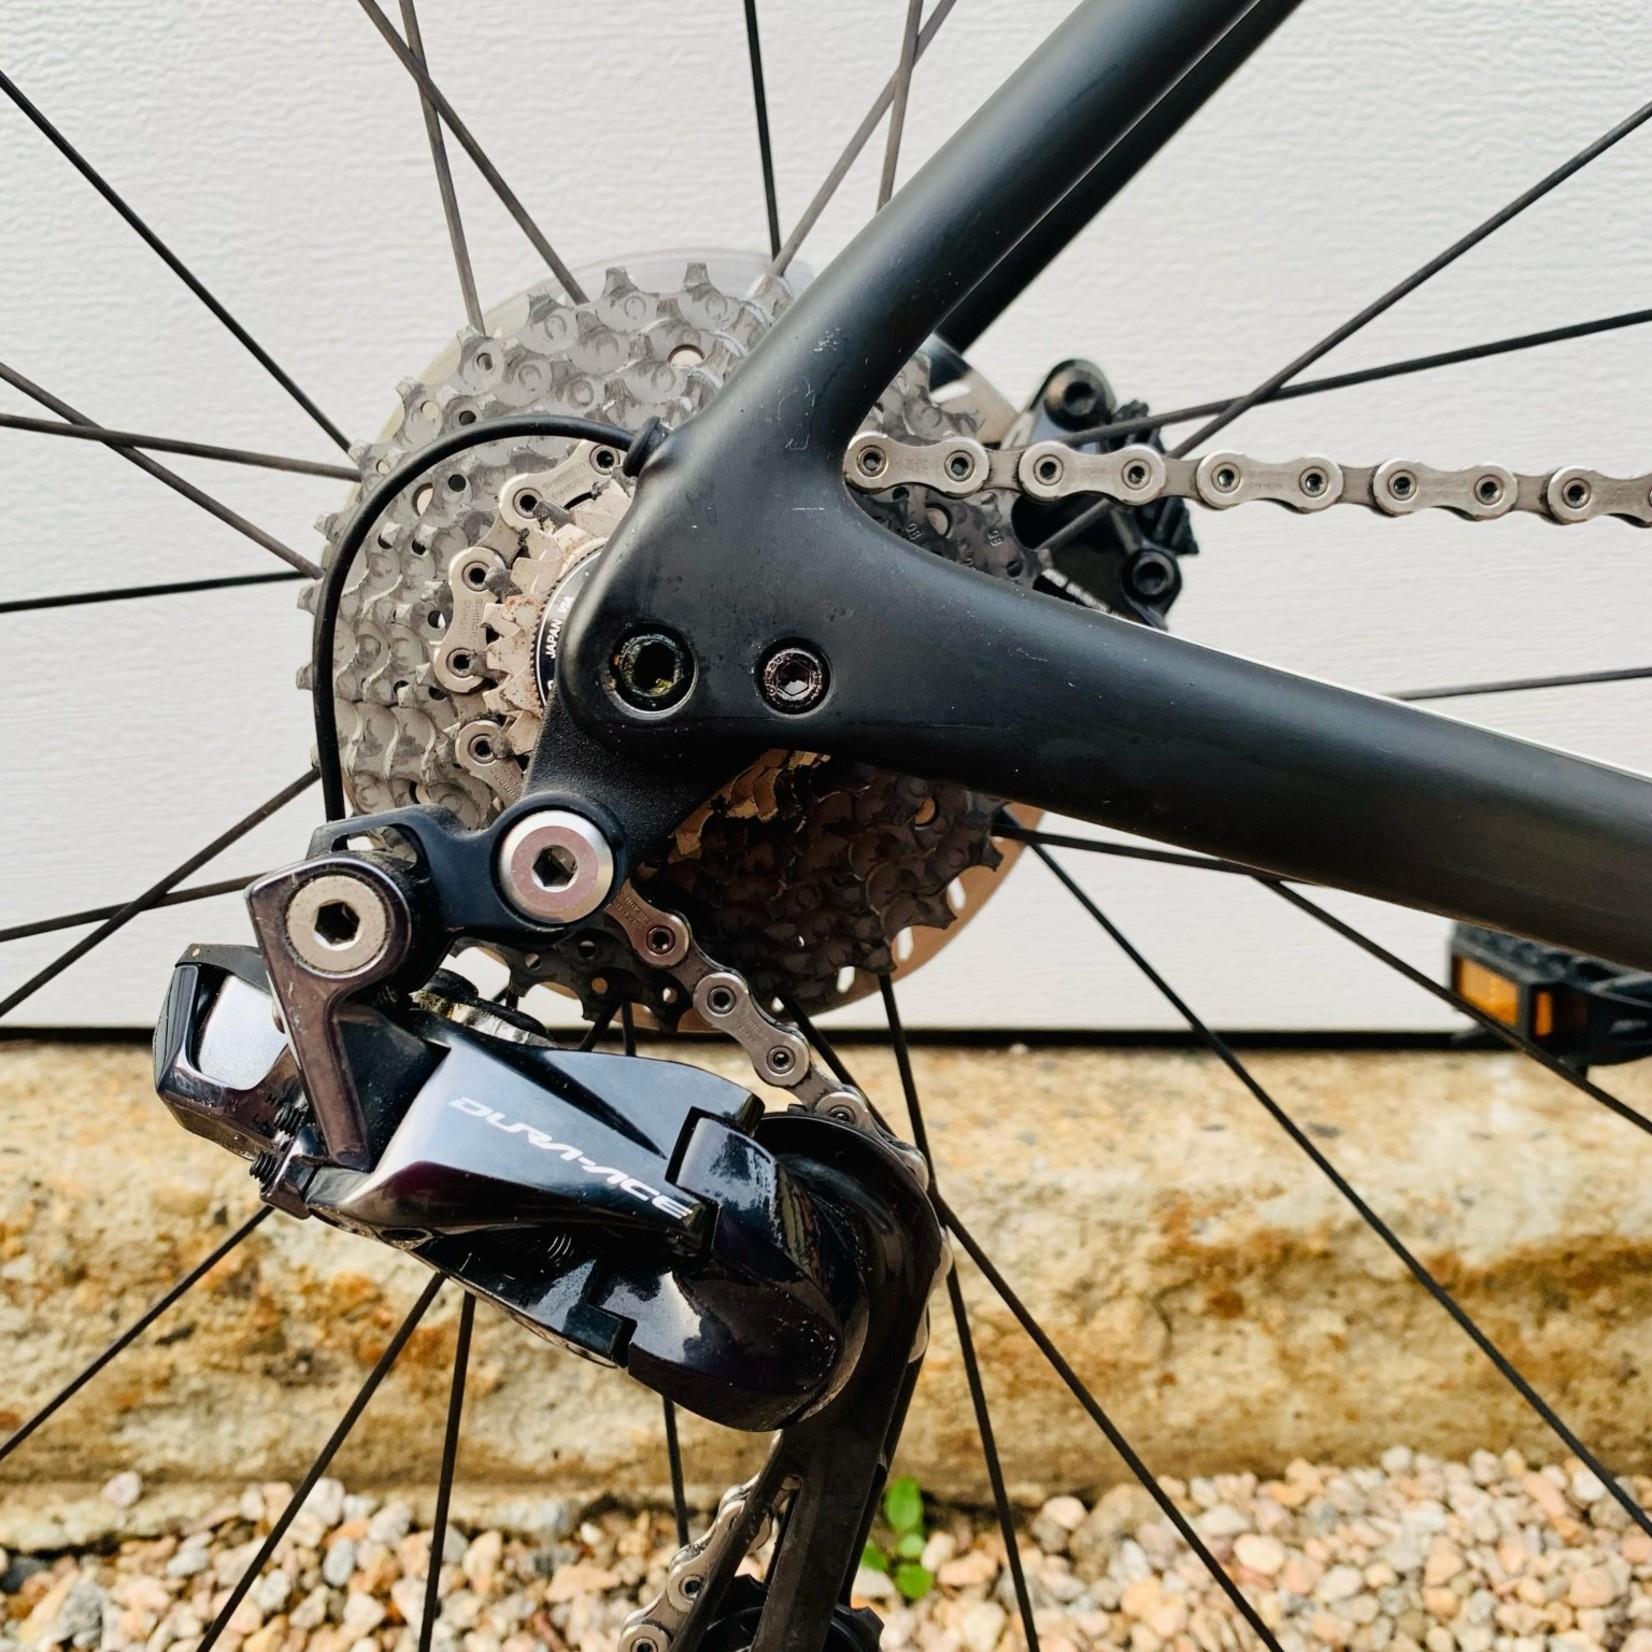 Specialized 2019 Specialized S-Works Roubaix Di2 54cm Black USED